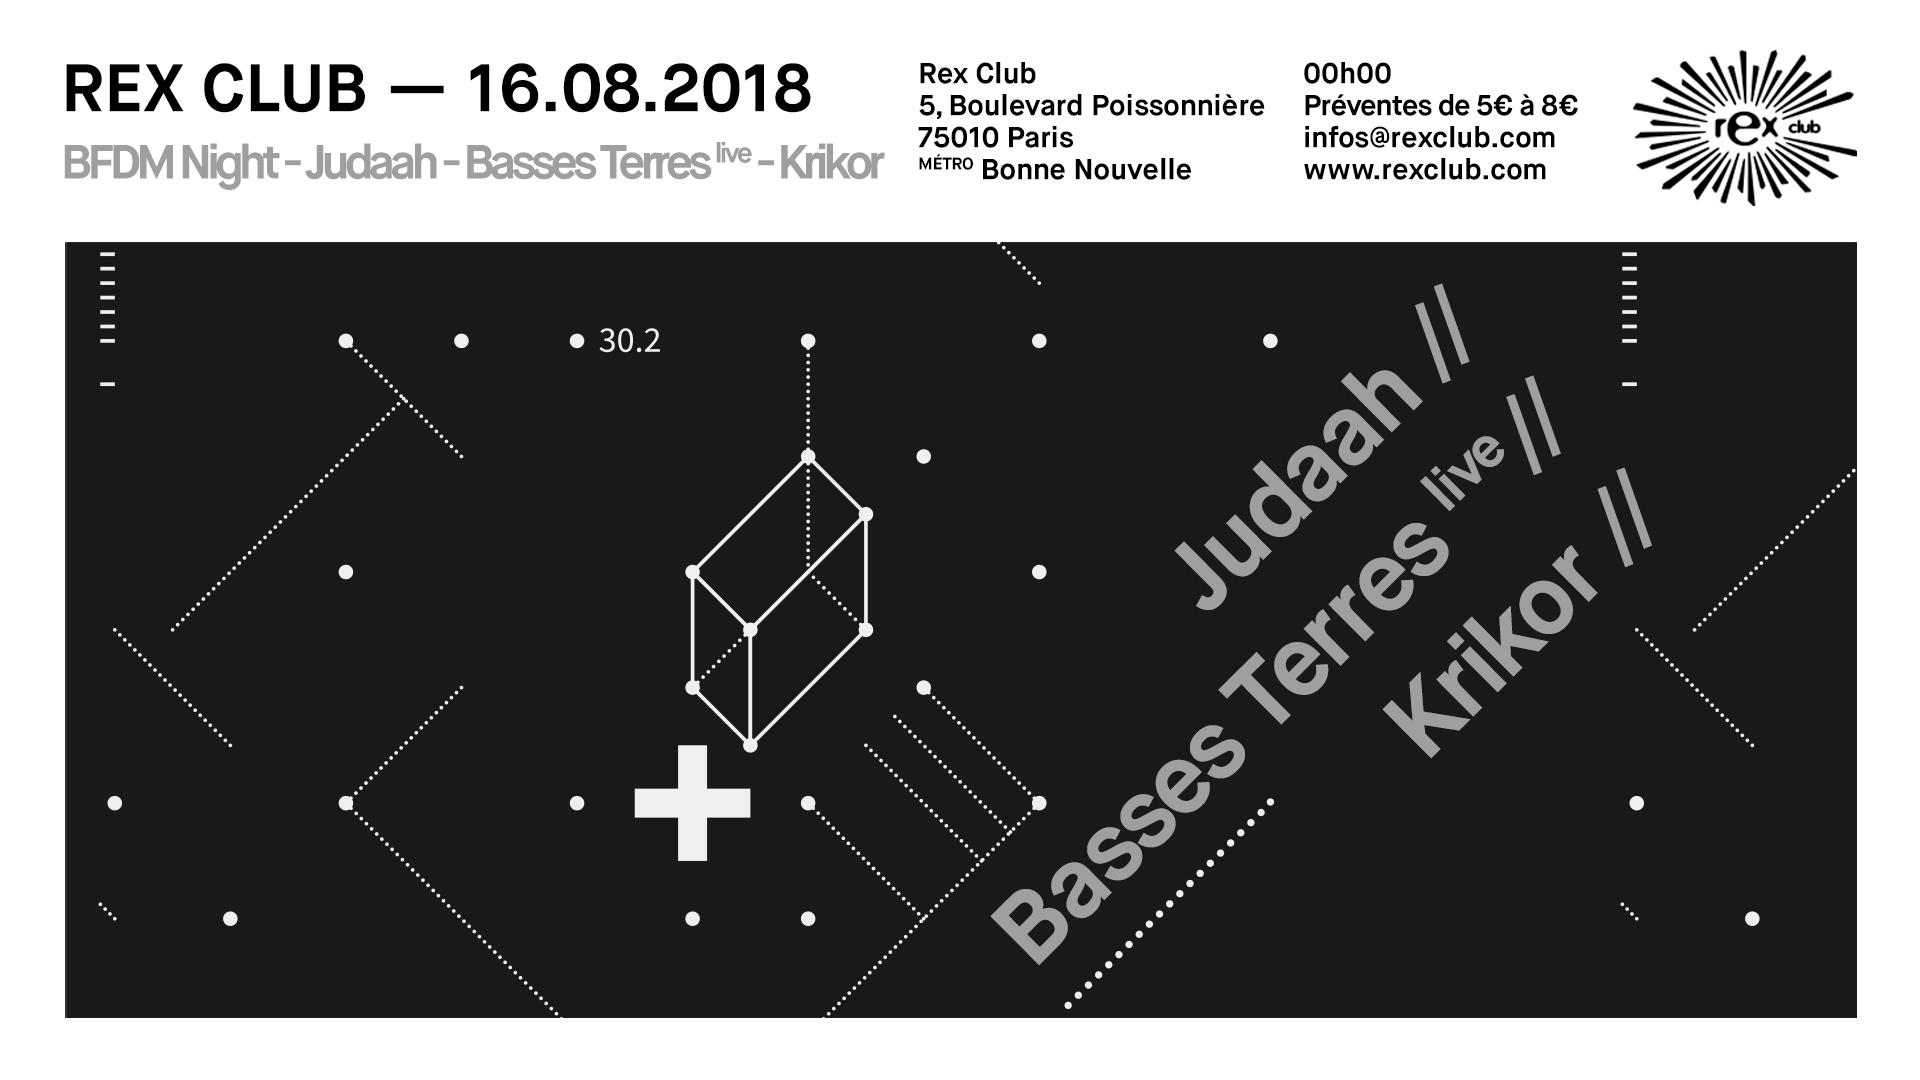 20180816_rex_club_BFDM_night_facebook_event_banner_1920x1080